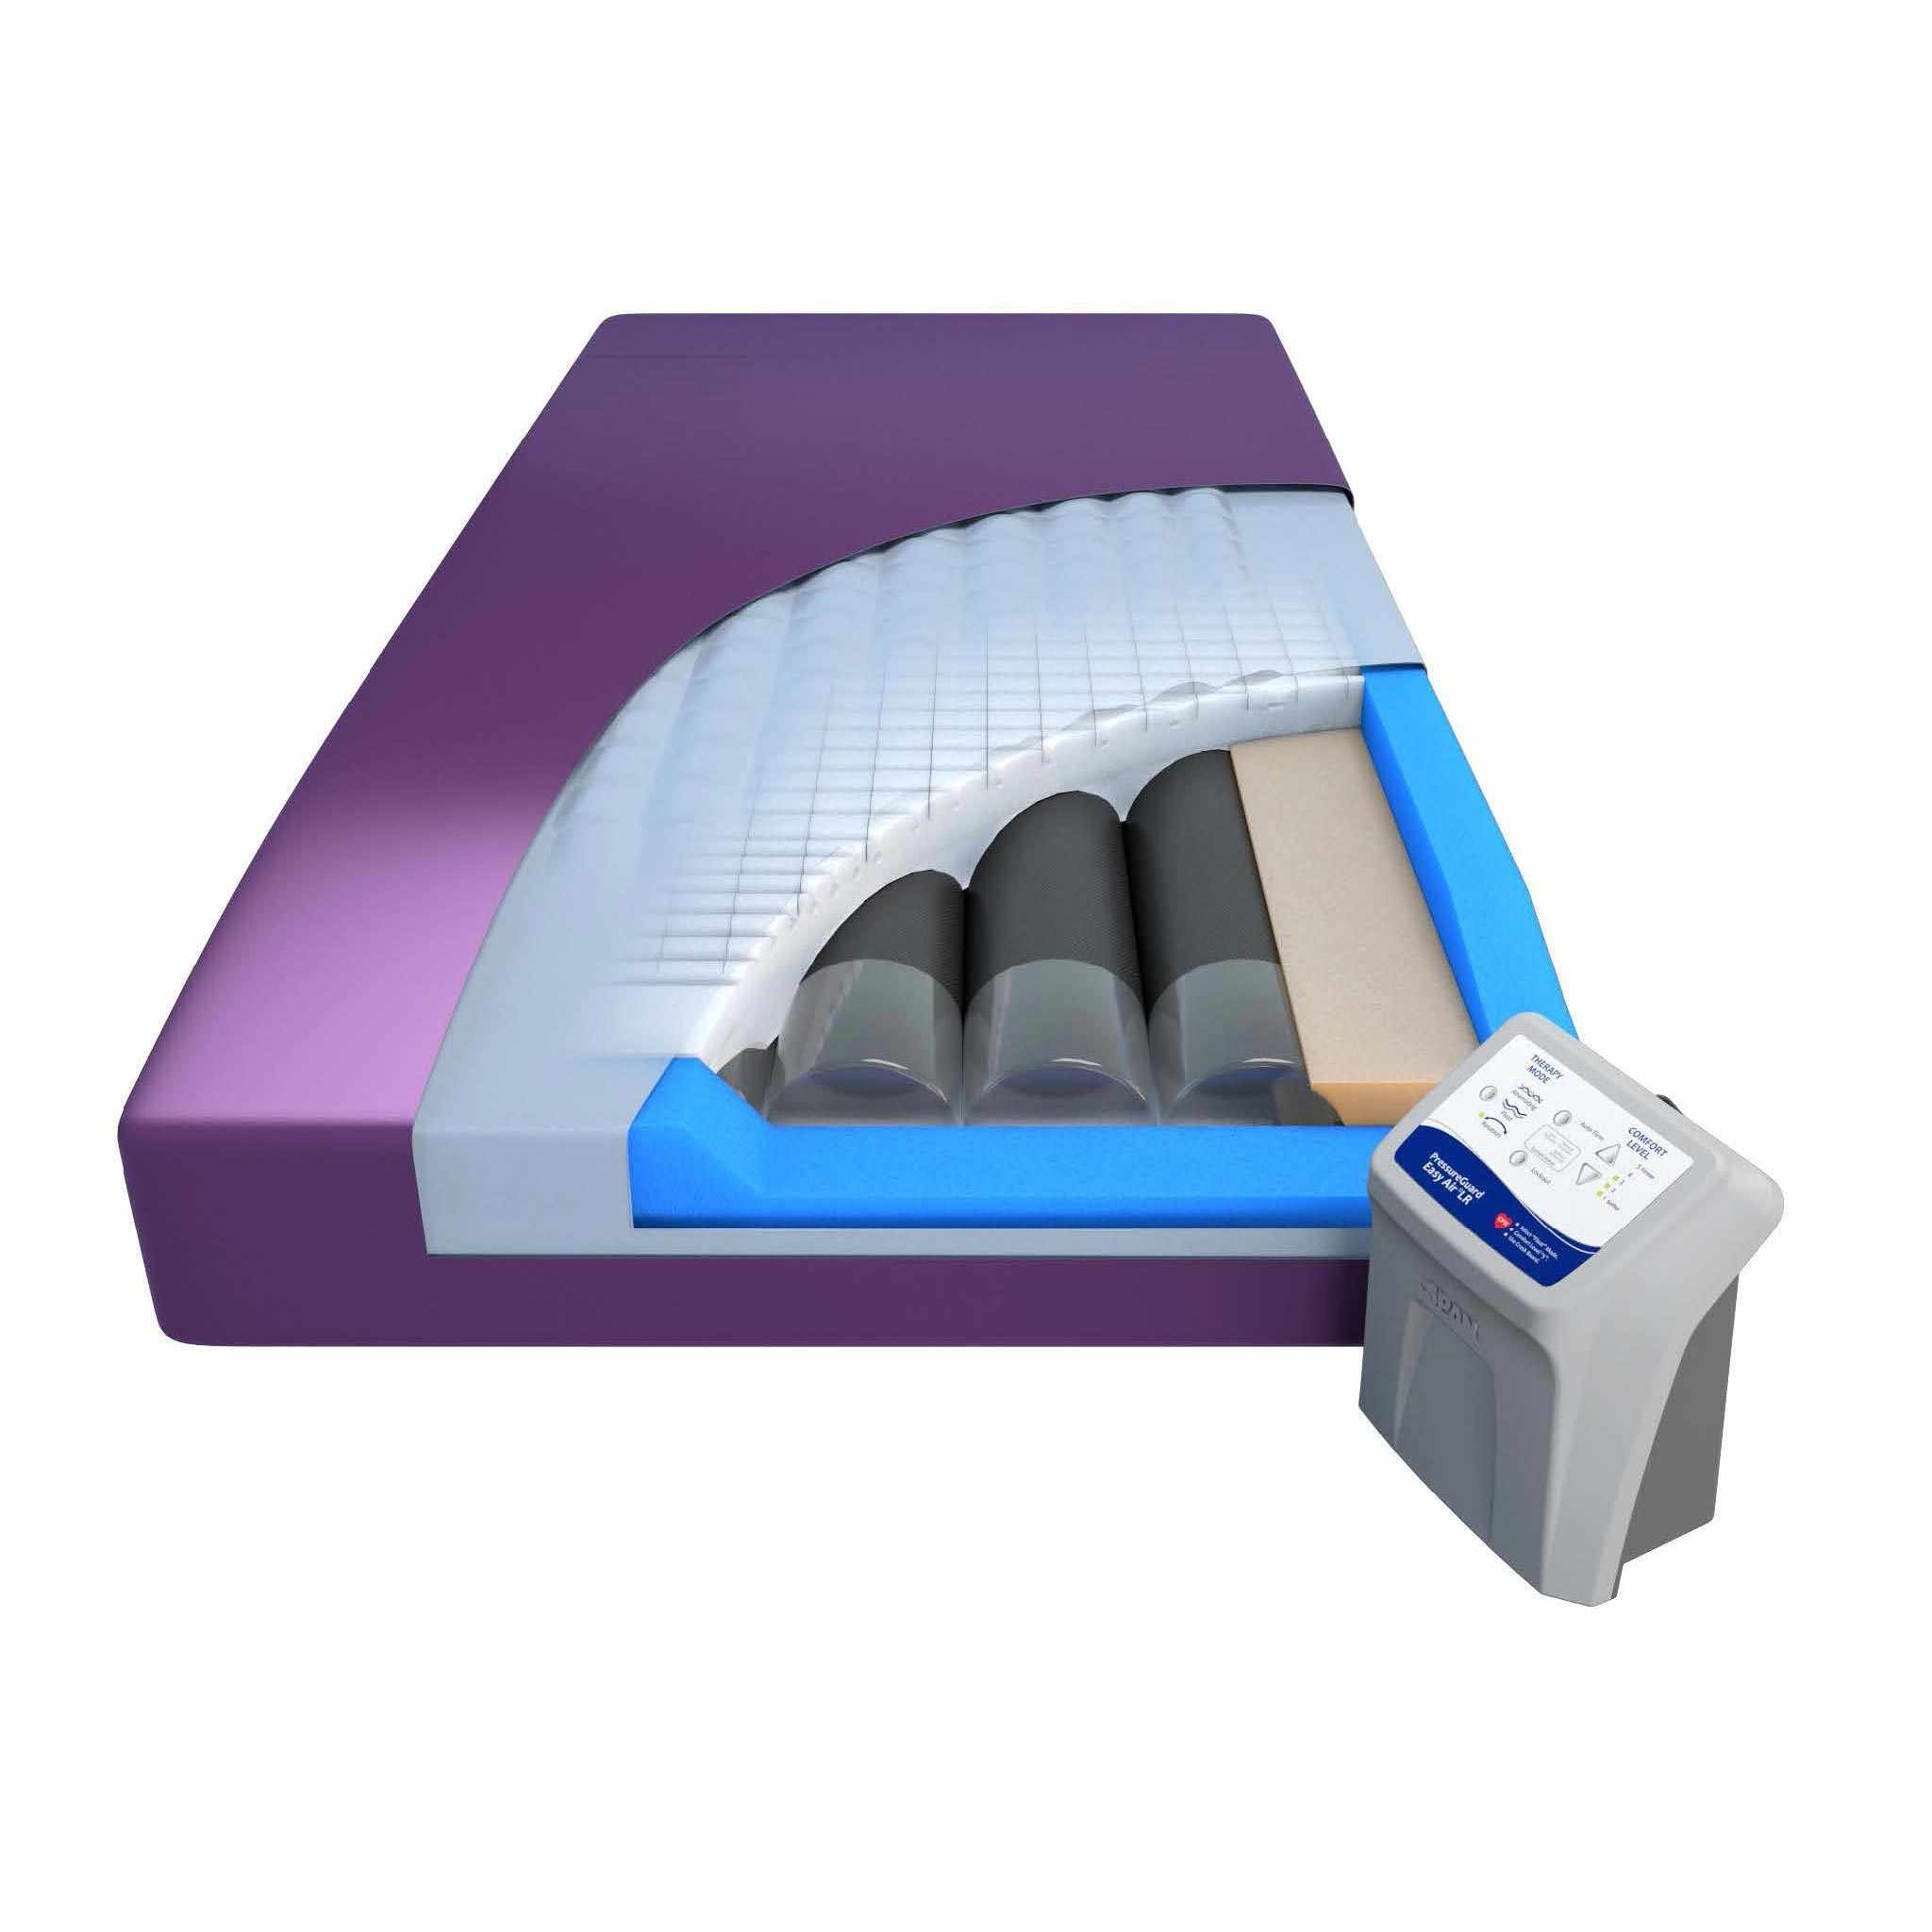 Span America pressureguard easy air LR mattress